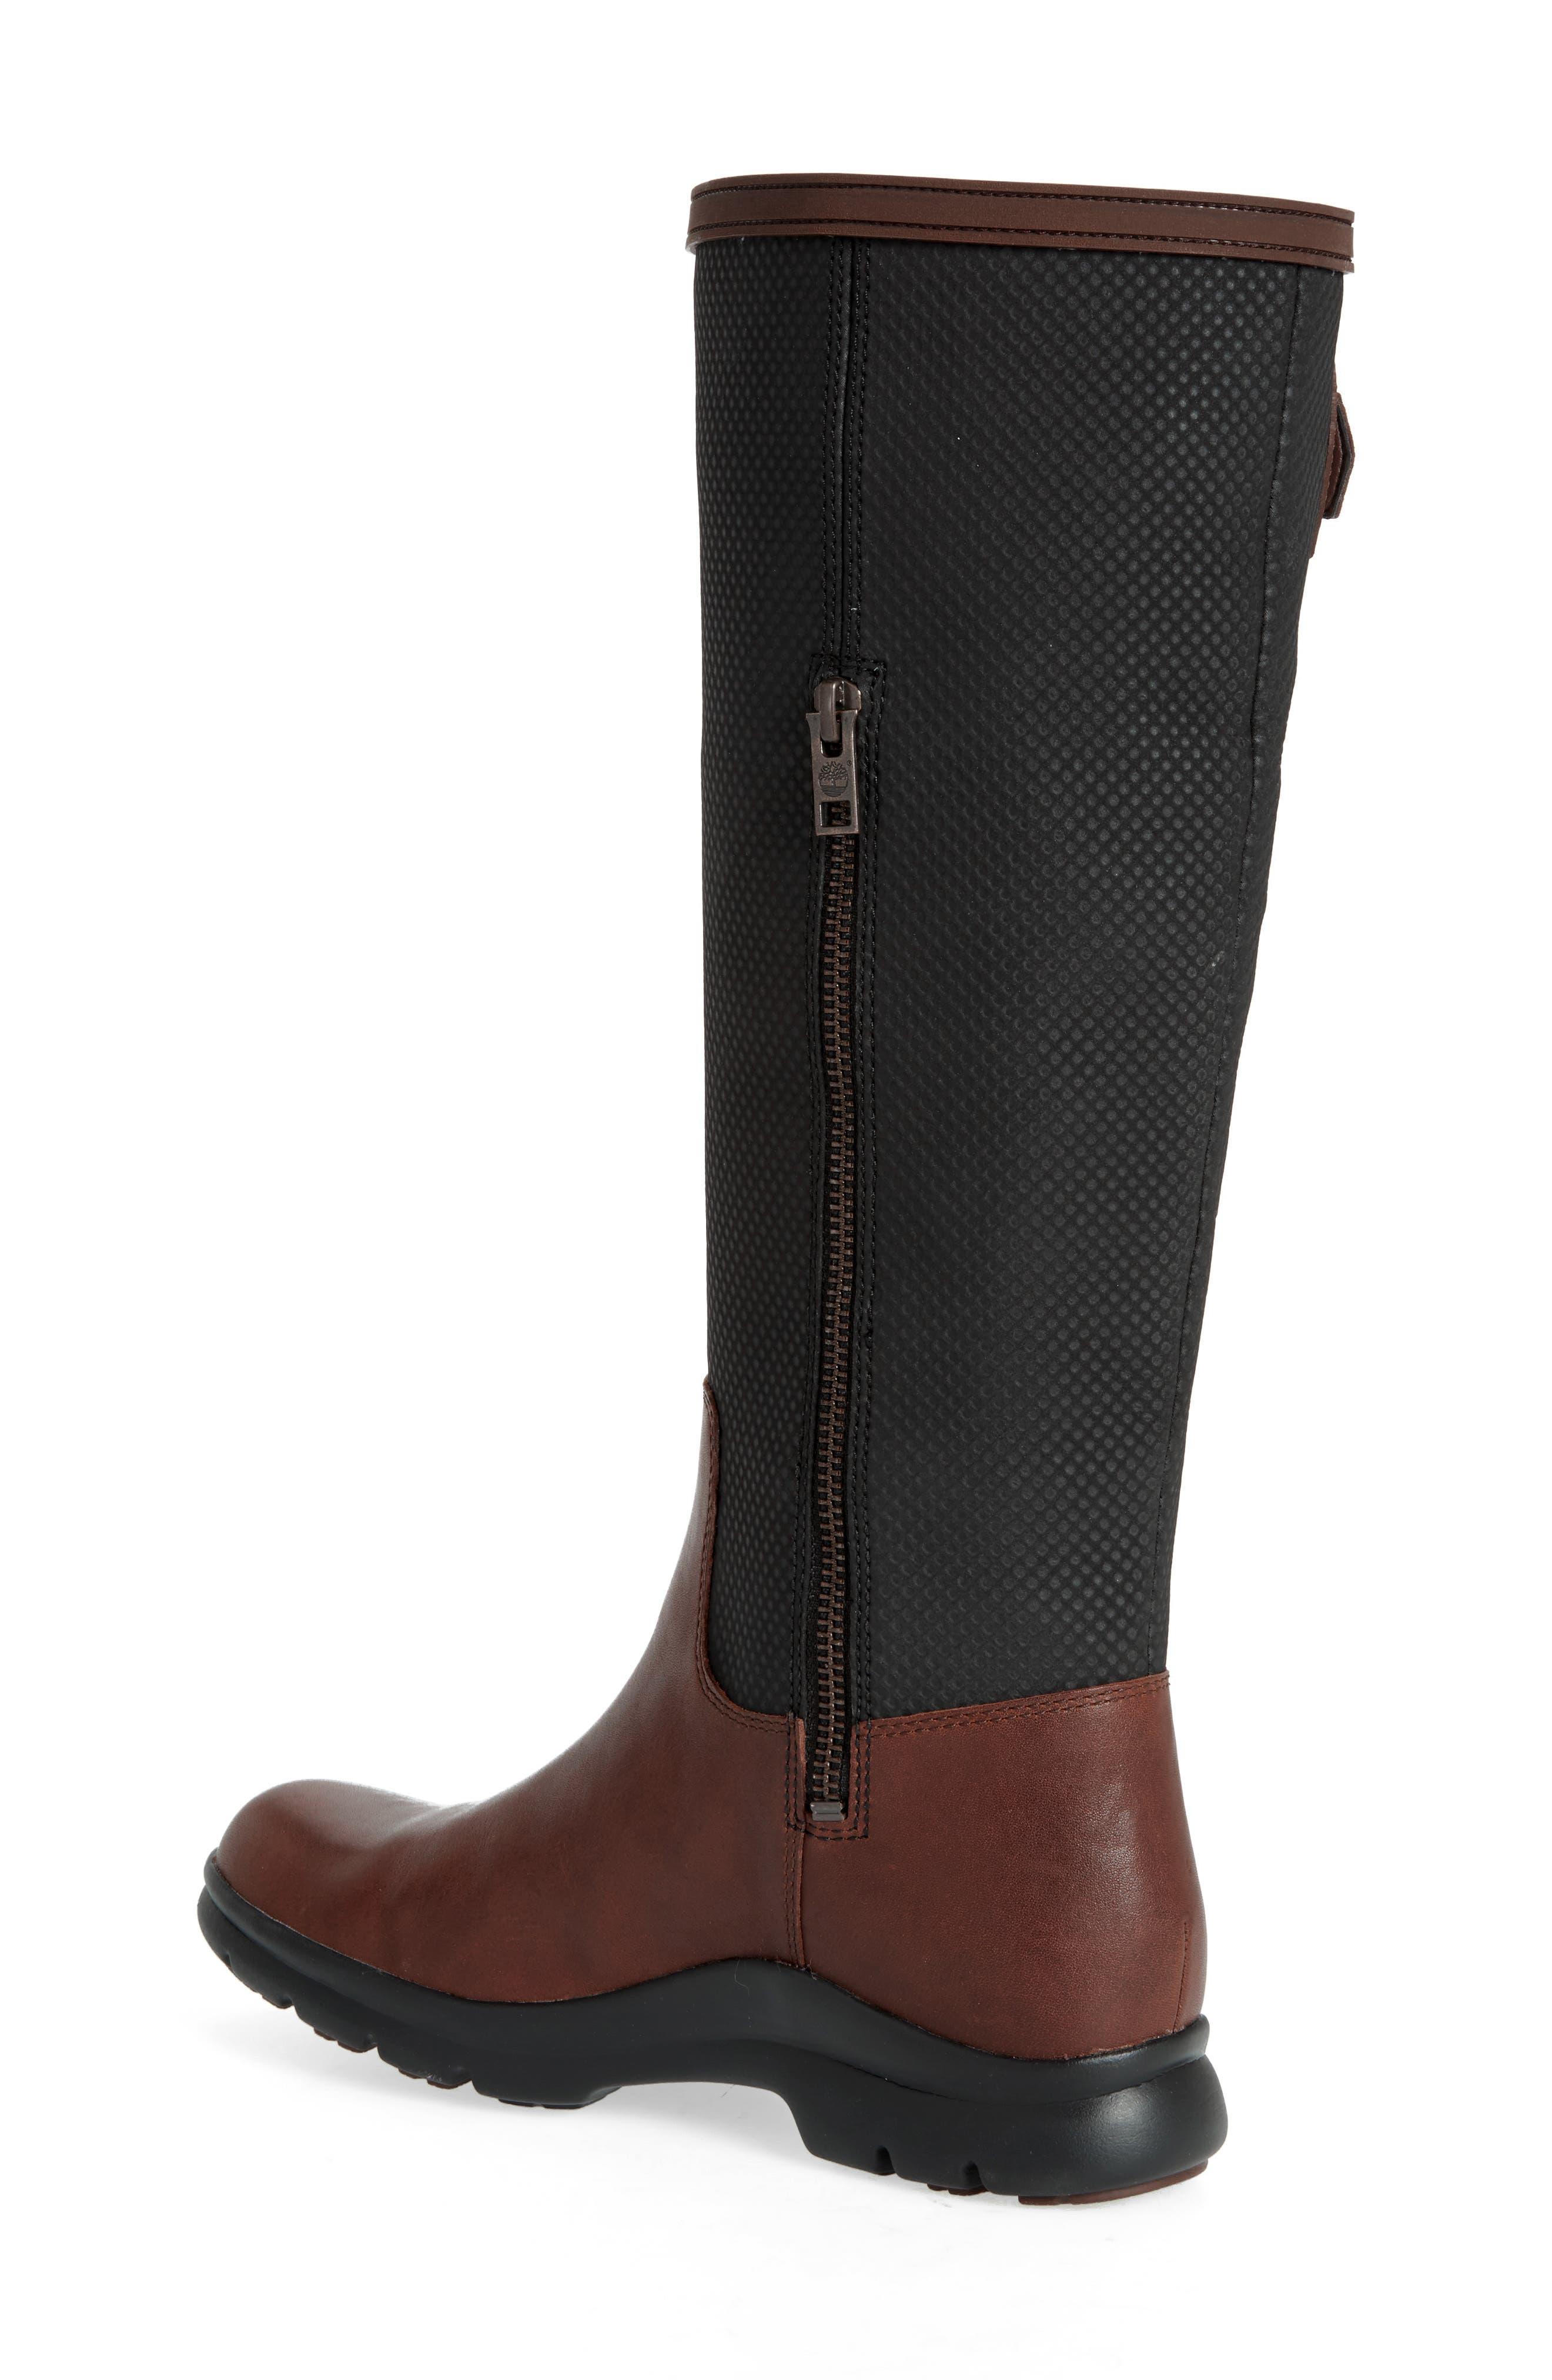 Turain Tall Waterproof Boot,                             Alternate thumbnail 2, color,                             Medium Brown Leather